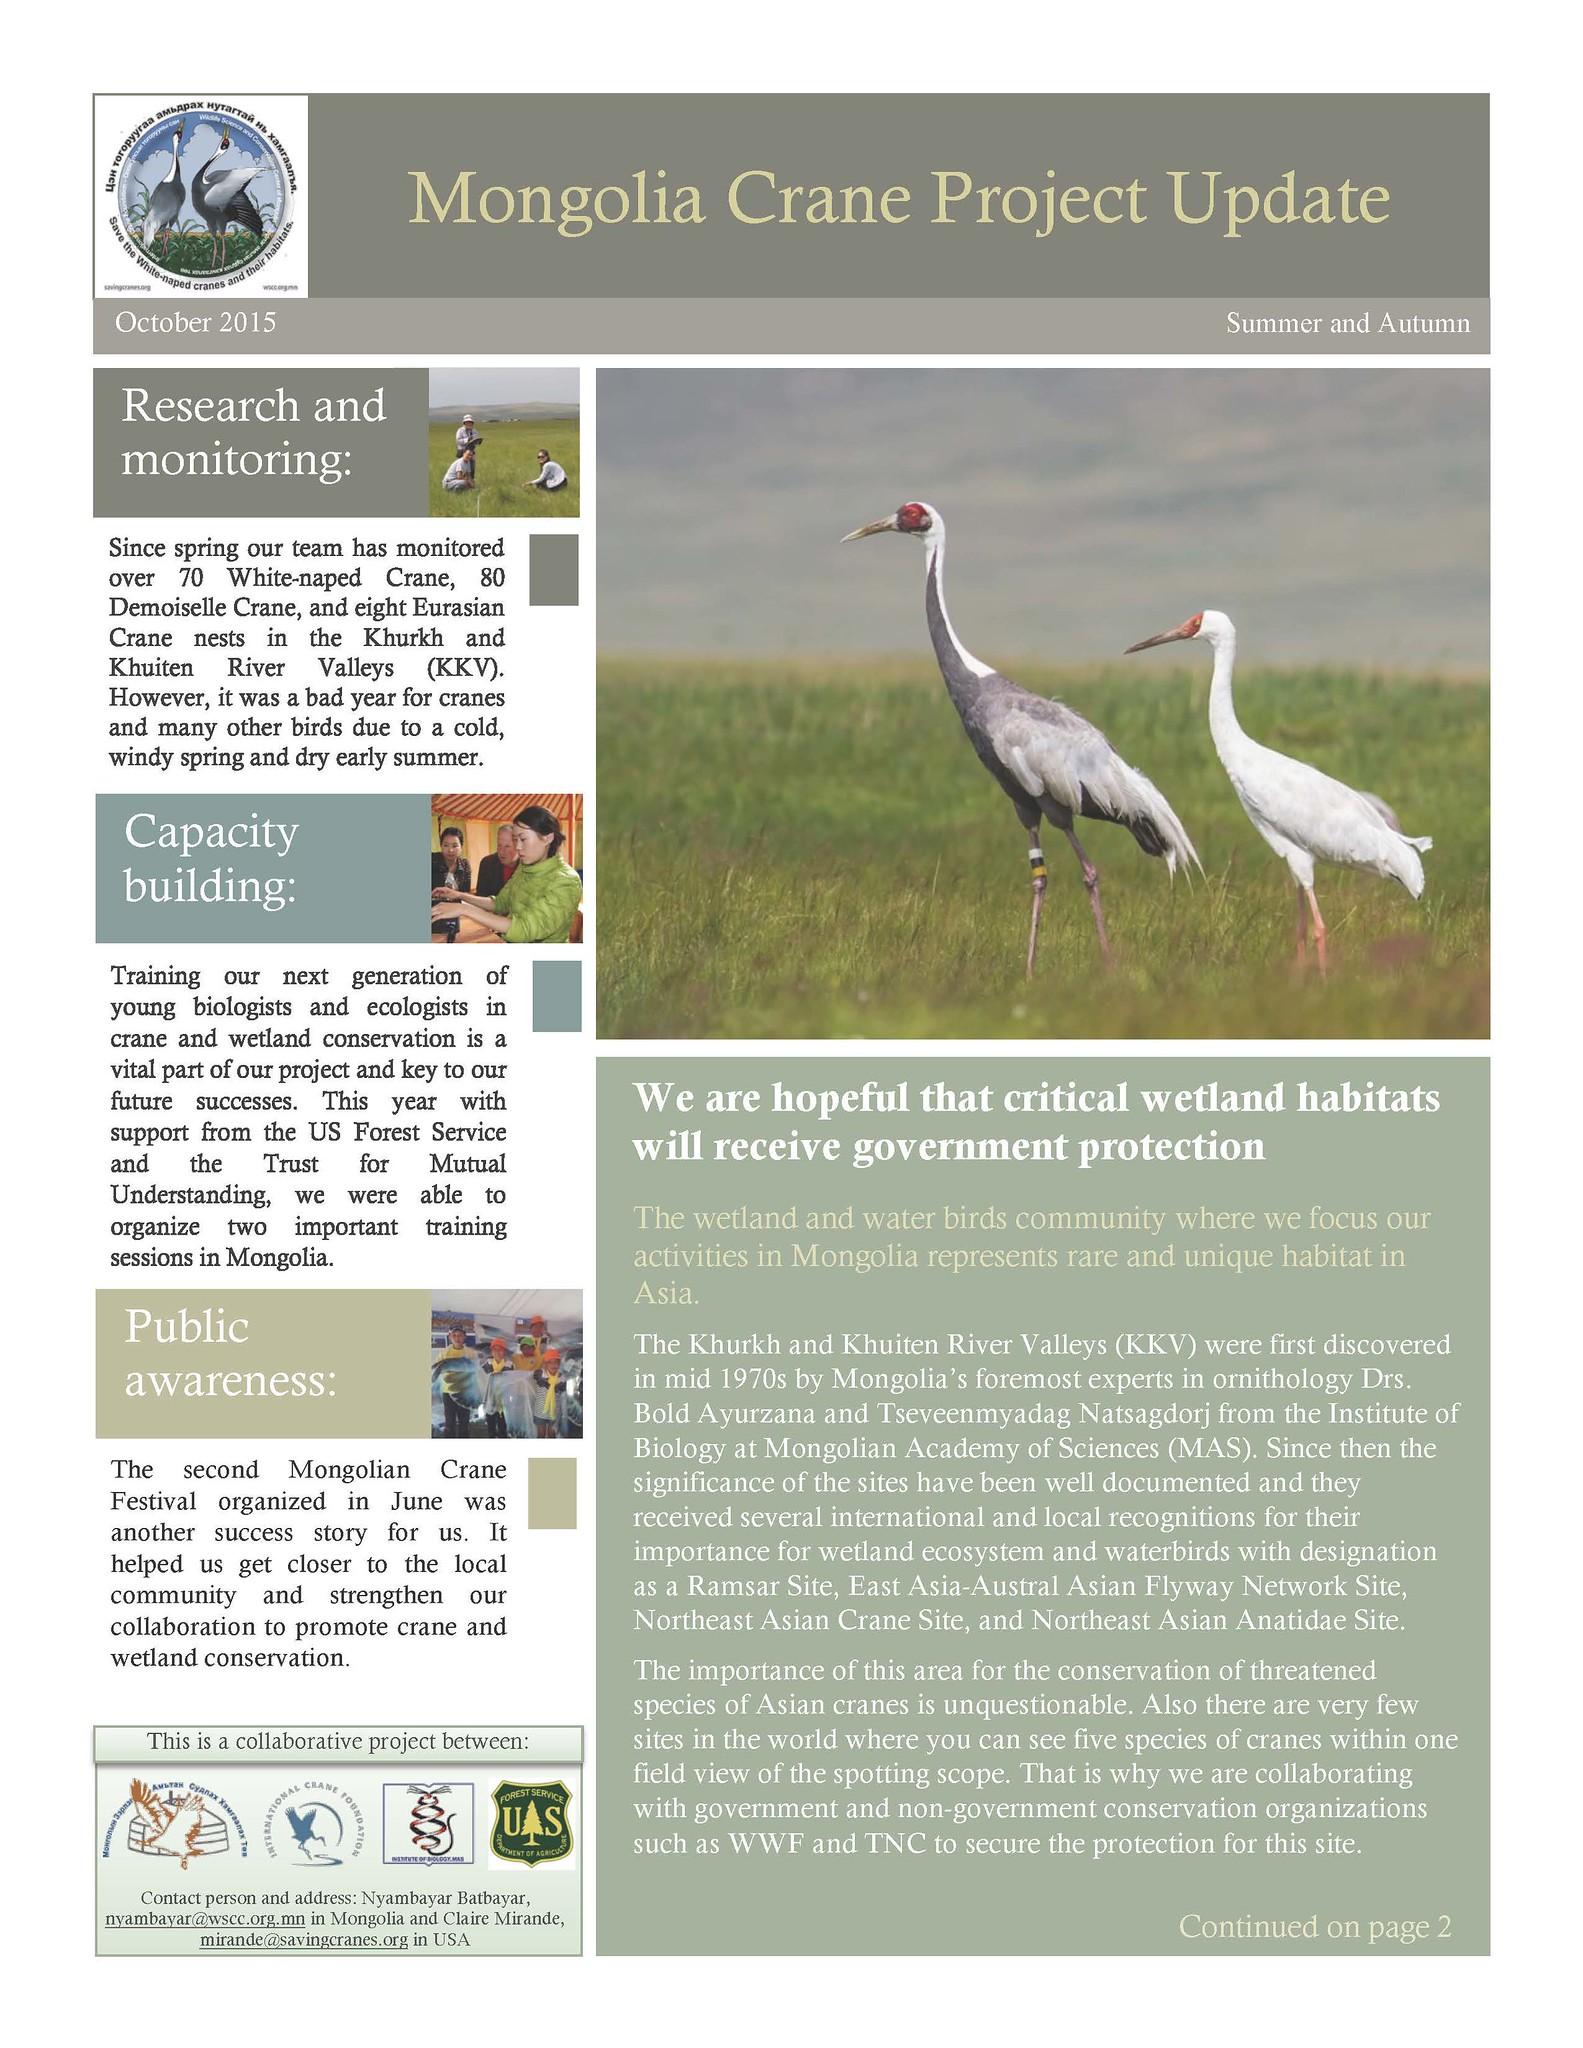 Mongolia Crane Project FINAL_Page_1